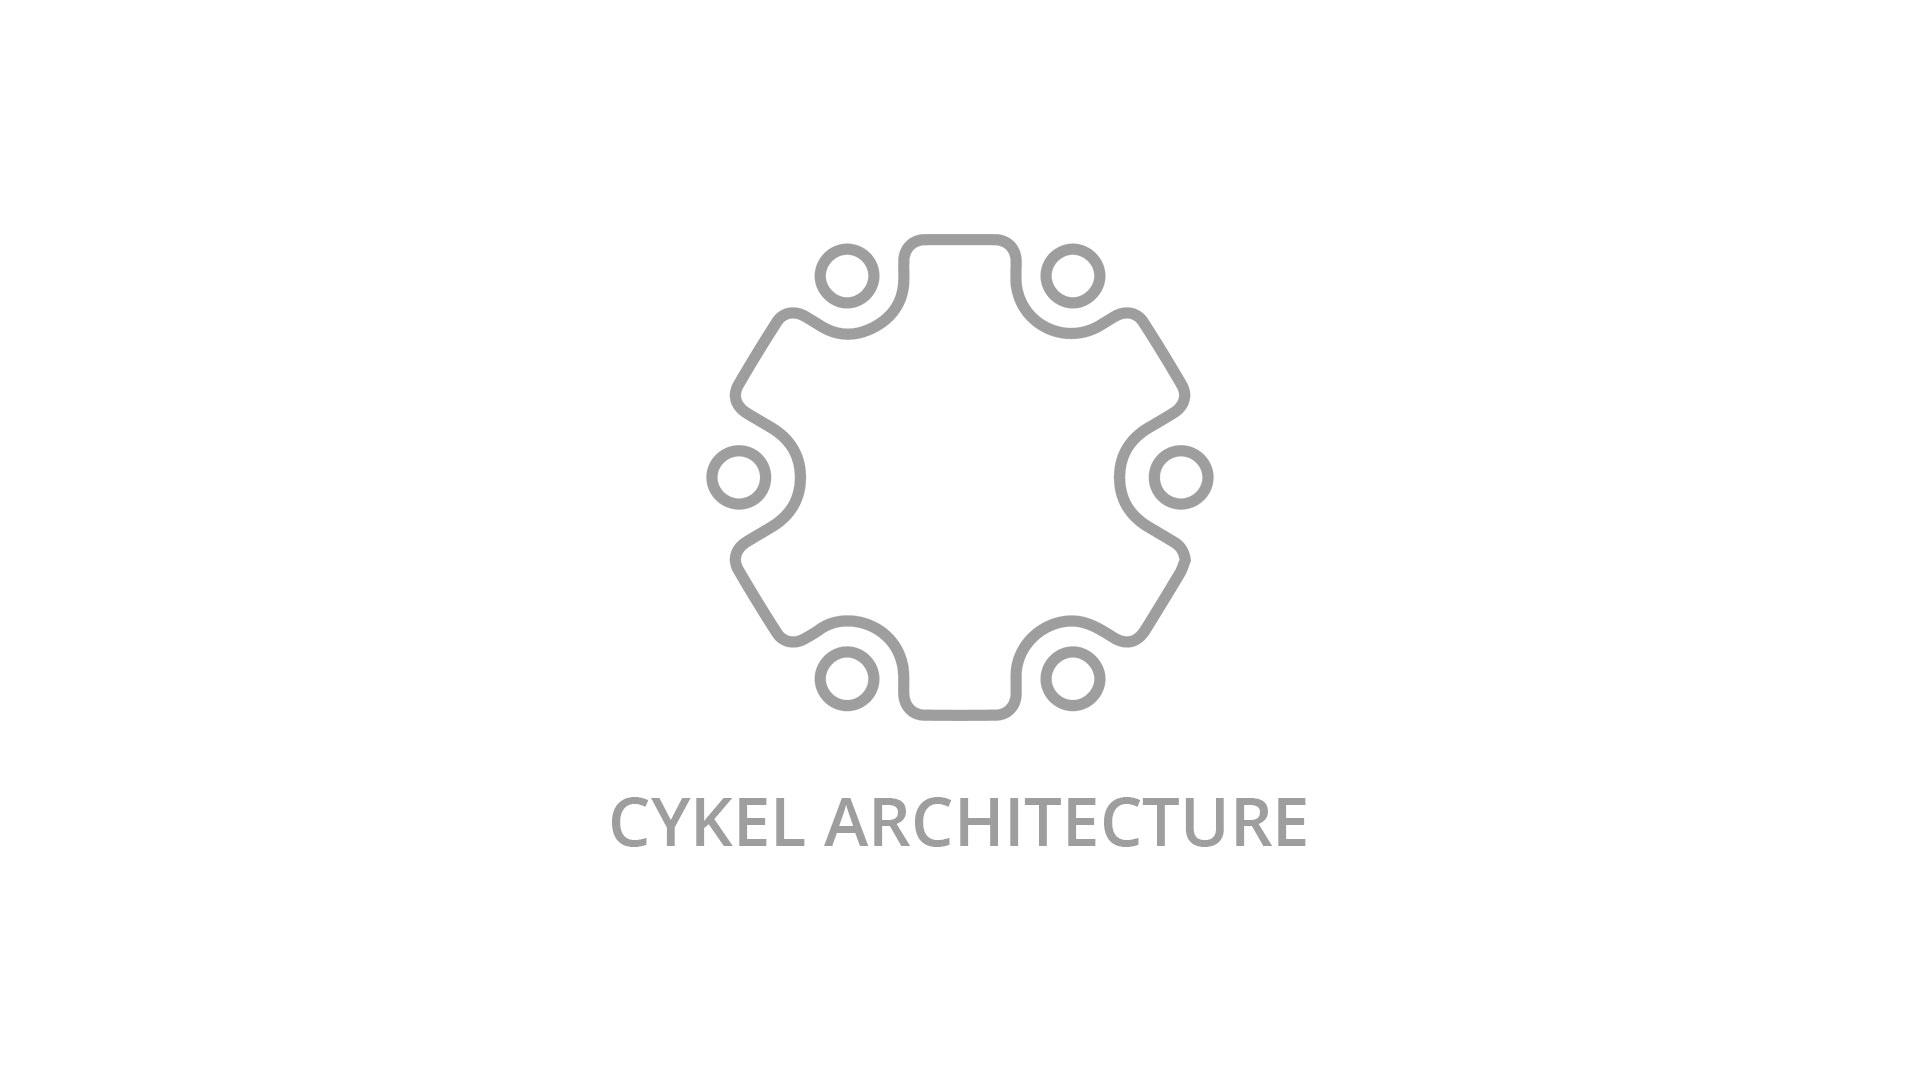 cykel architecture logo